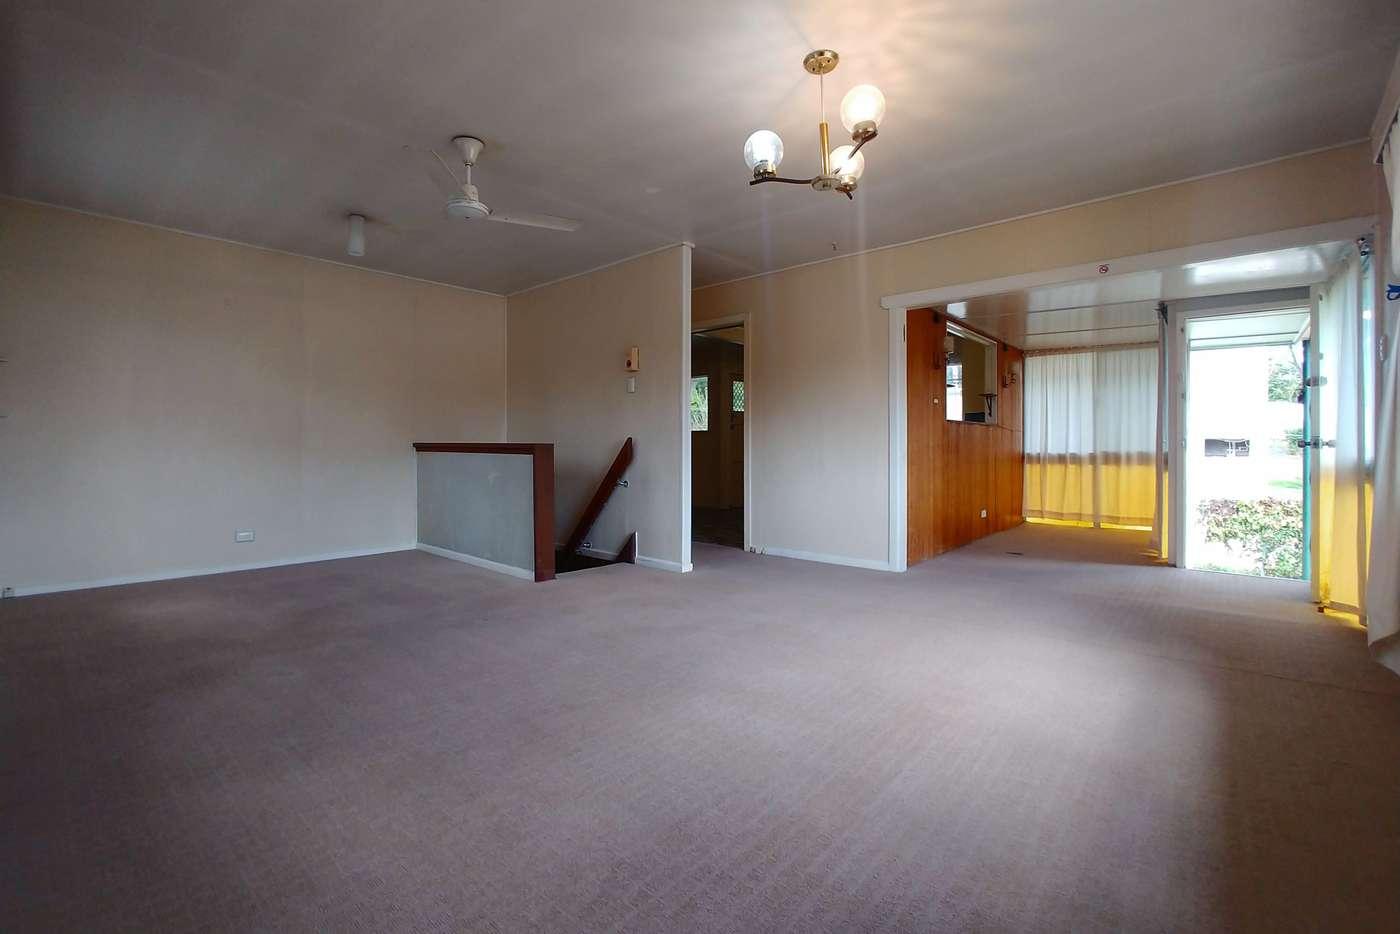 Sixth view of Homely house listing, 139 Mt Gravatt-Capalaba Road, Upper Mount Gravatt QLD 4122